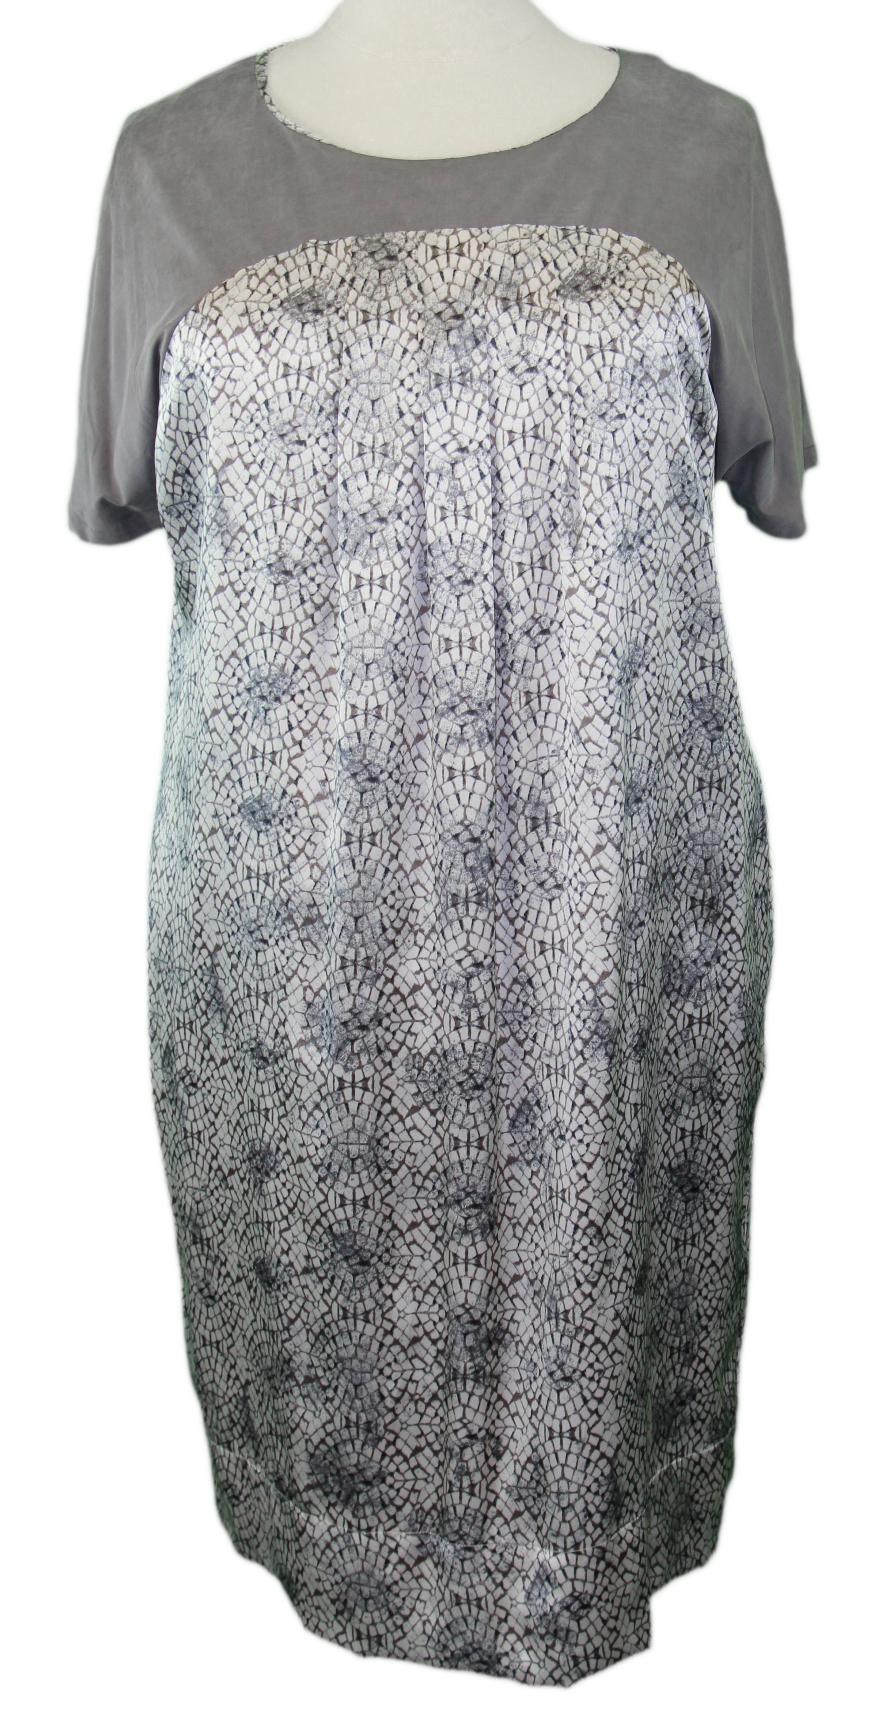 Marina Rinaldi By Maxmara Indice Medium Grau Grafik Kurzärmliges Kleid